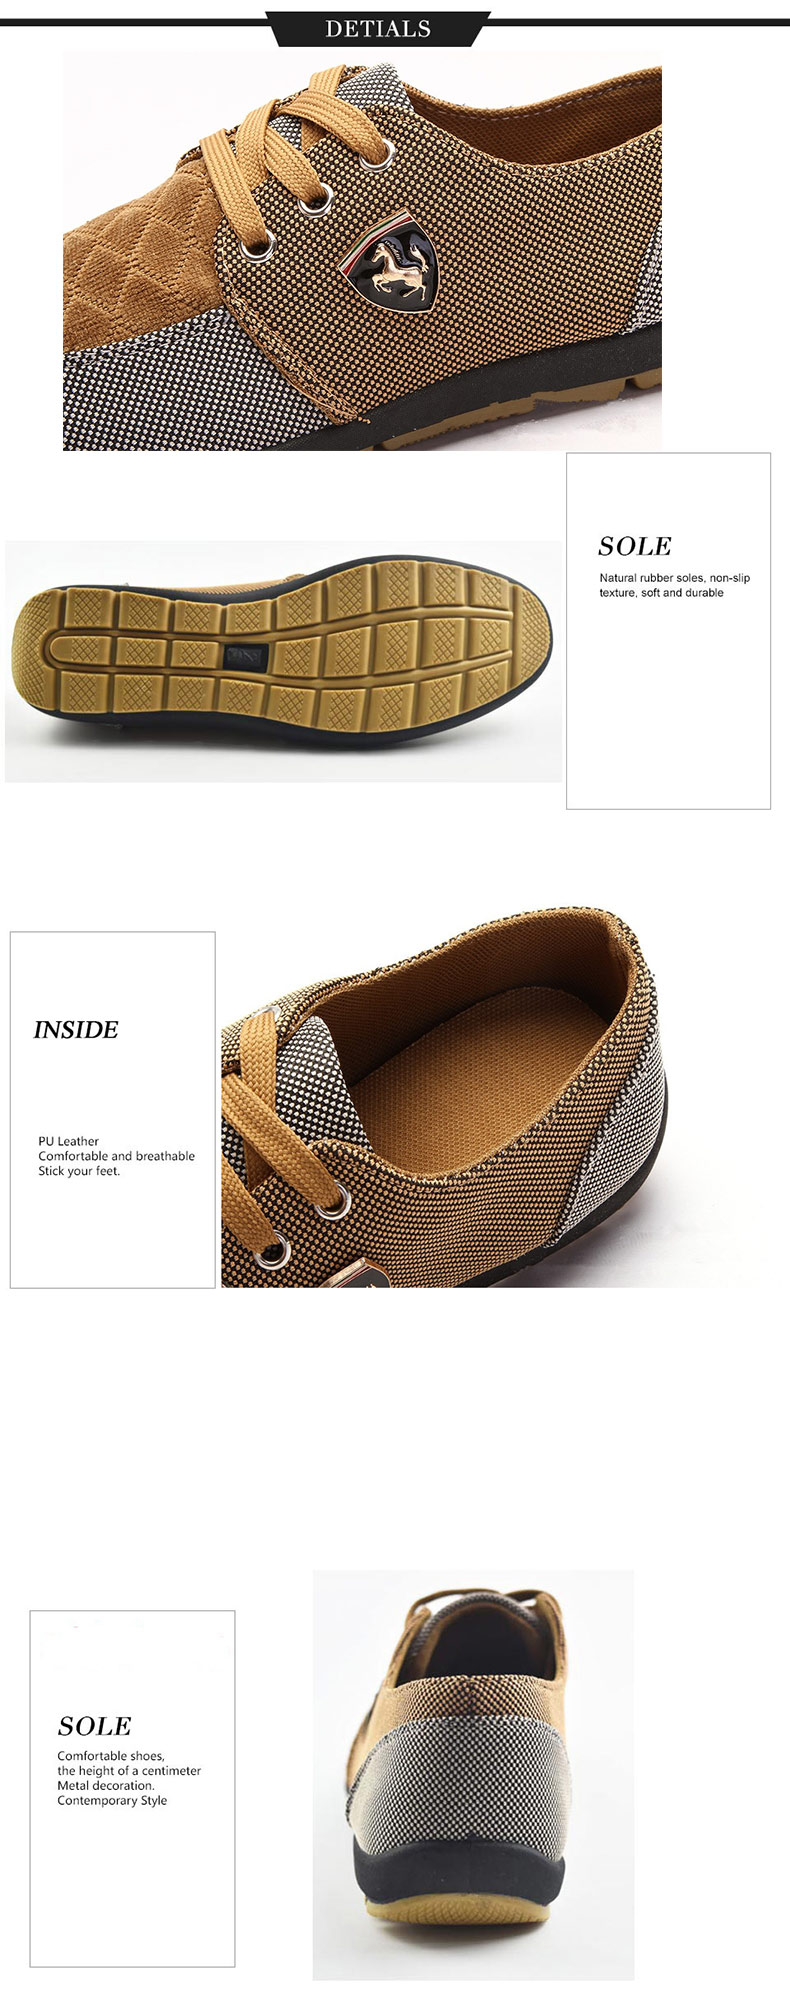 HTB1PAZceHSYBuNjSspfq6AZCpXa7 2019 Fashion Canvas Shoes Men Casual Shoes Summer Breathable Yellow Comfortbale Espadrilles Sneakers Men Flats Shoes Big Size